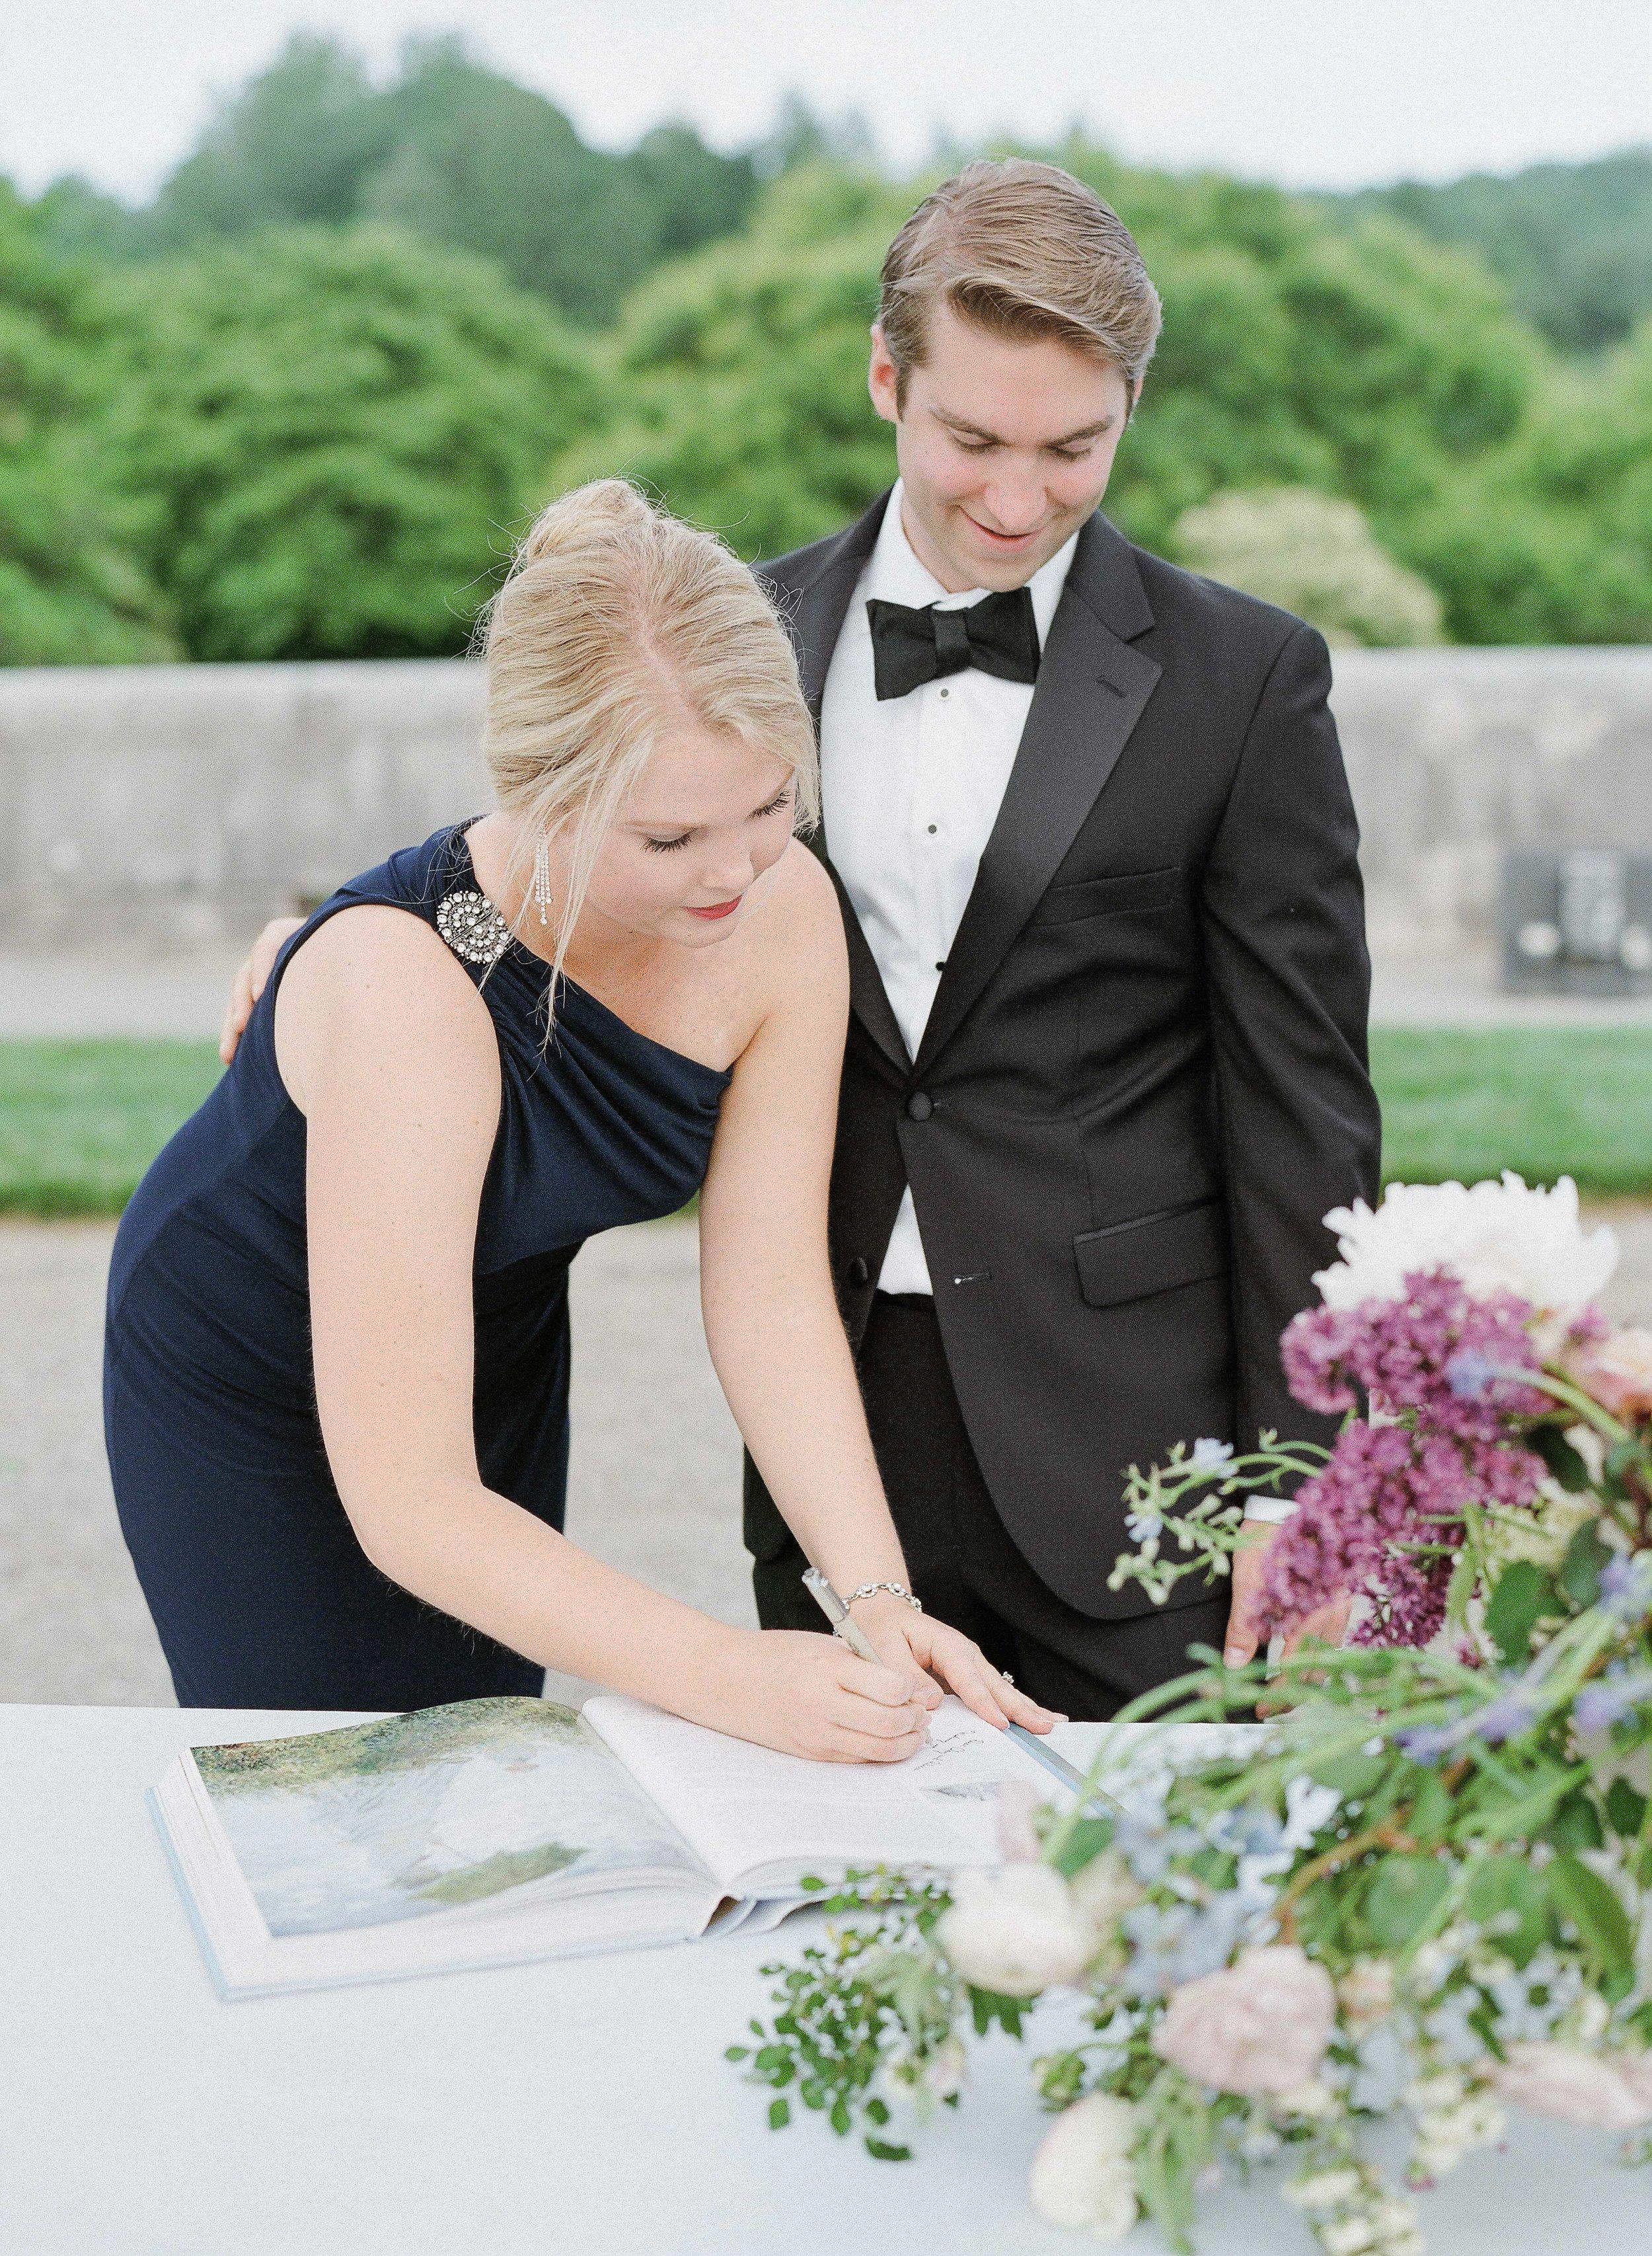 rebecca-clay-wedding-north-carolina-guest-book-signing-103228804.jpg